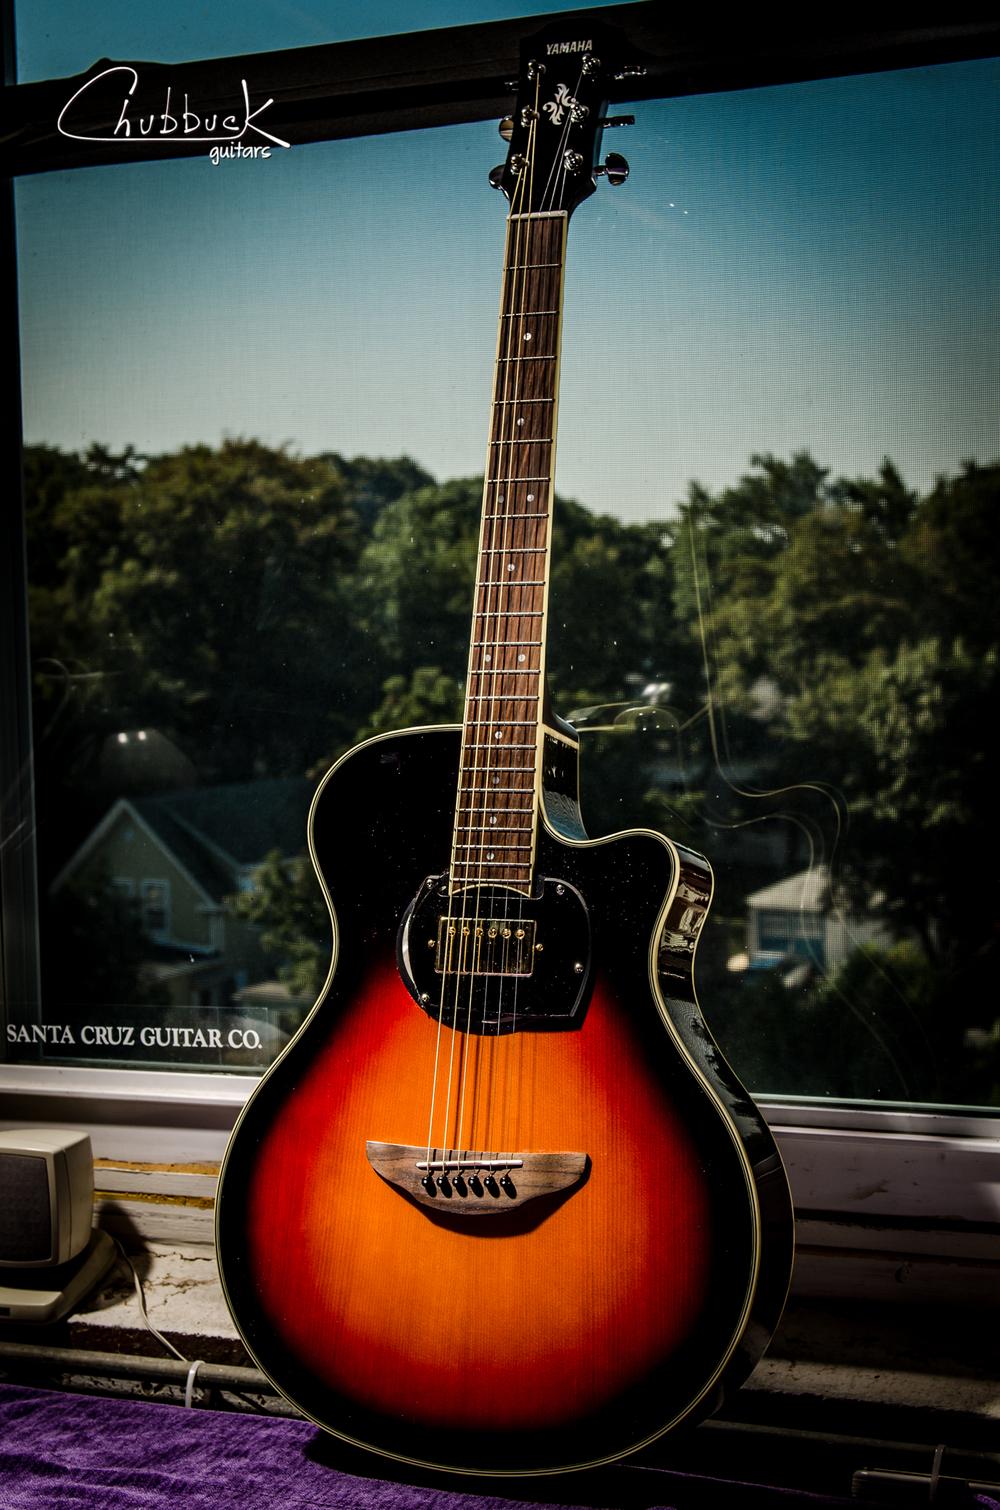 put a humbucker in the sound hole yamaha apx500iii 4 7 lbs chubbuck guitars making. Black Bedroom Furniture Sets. Home Design Ideas